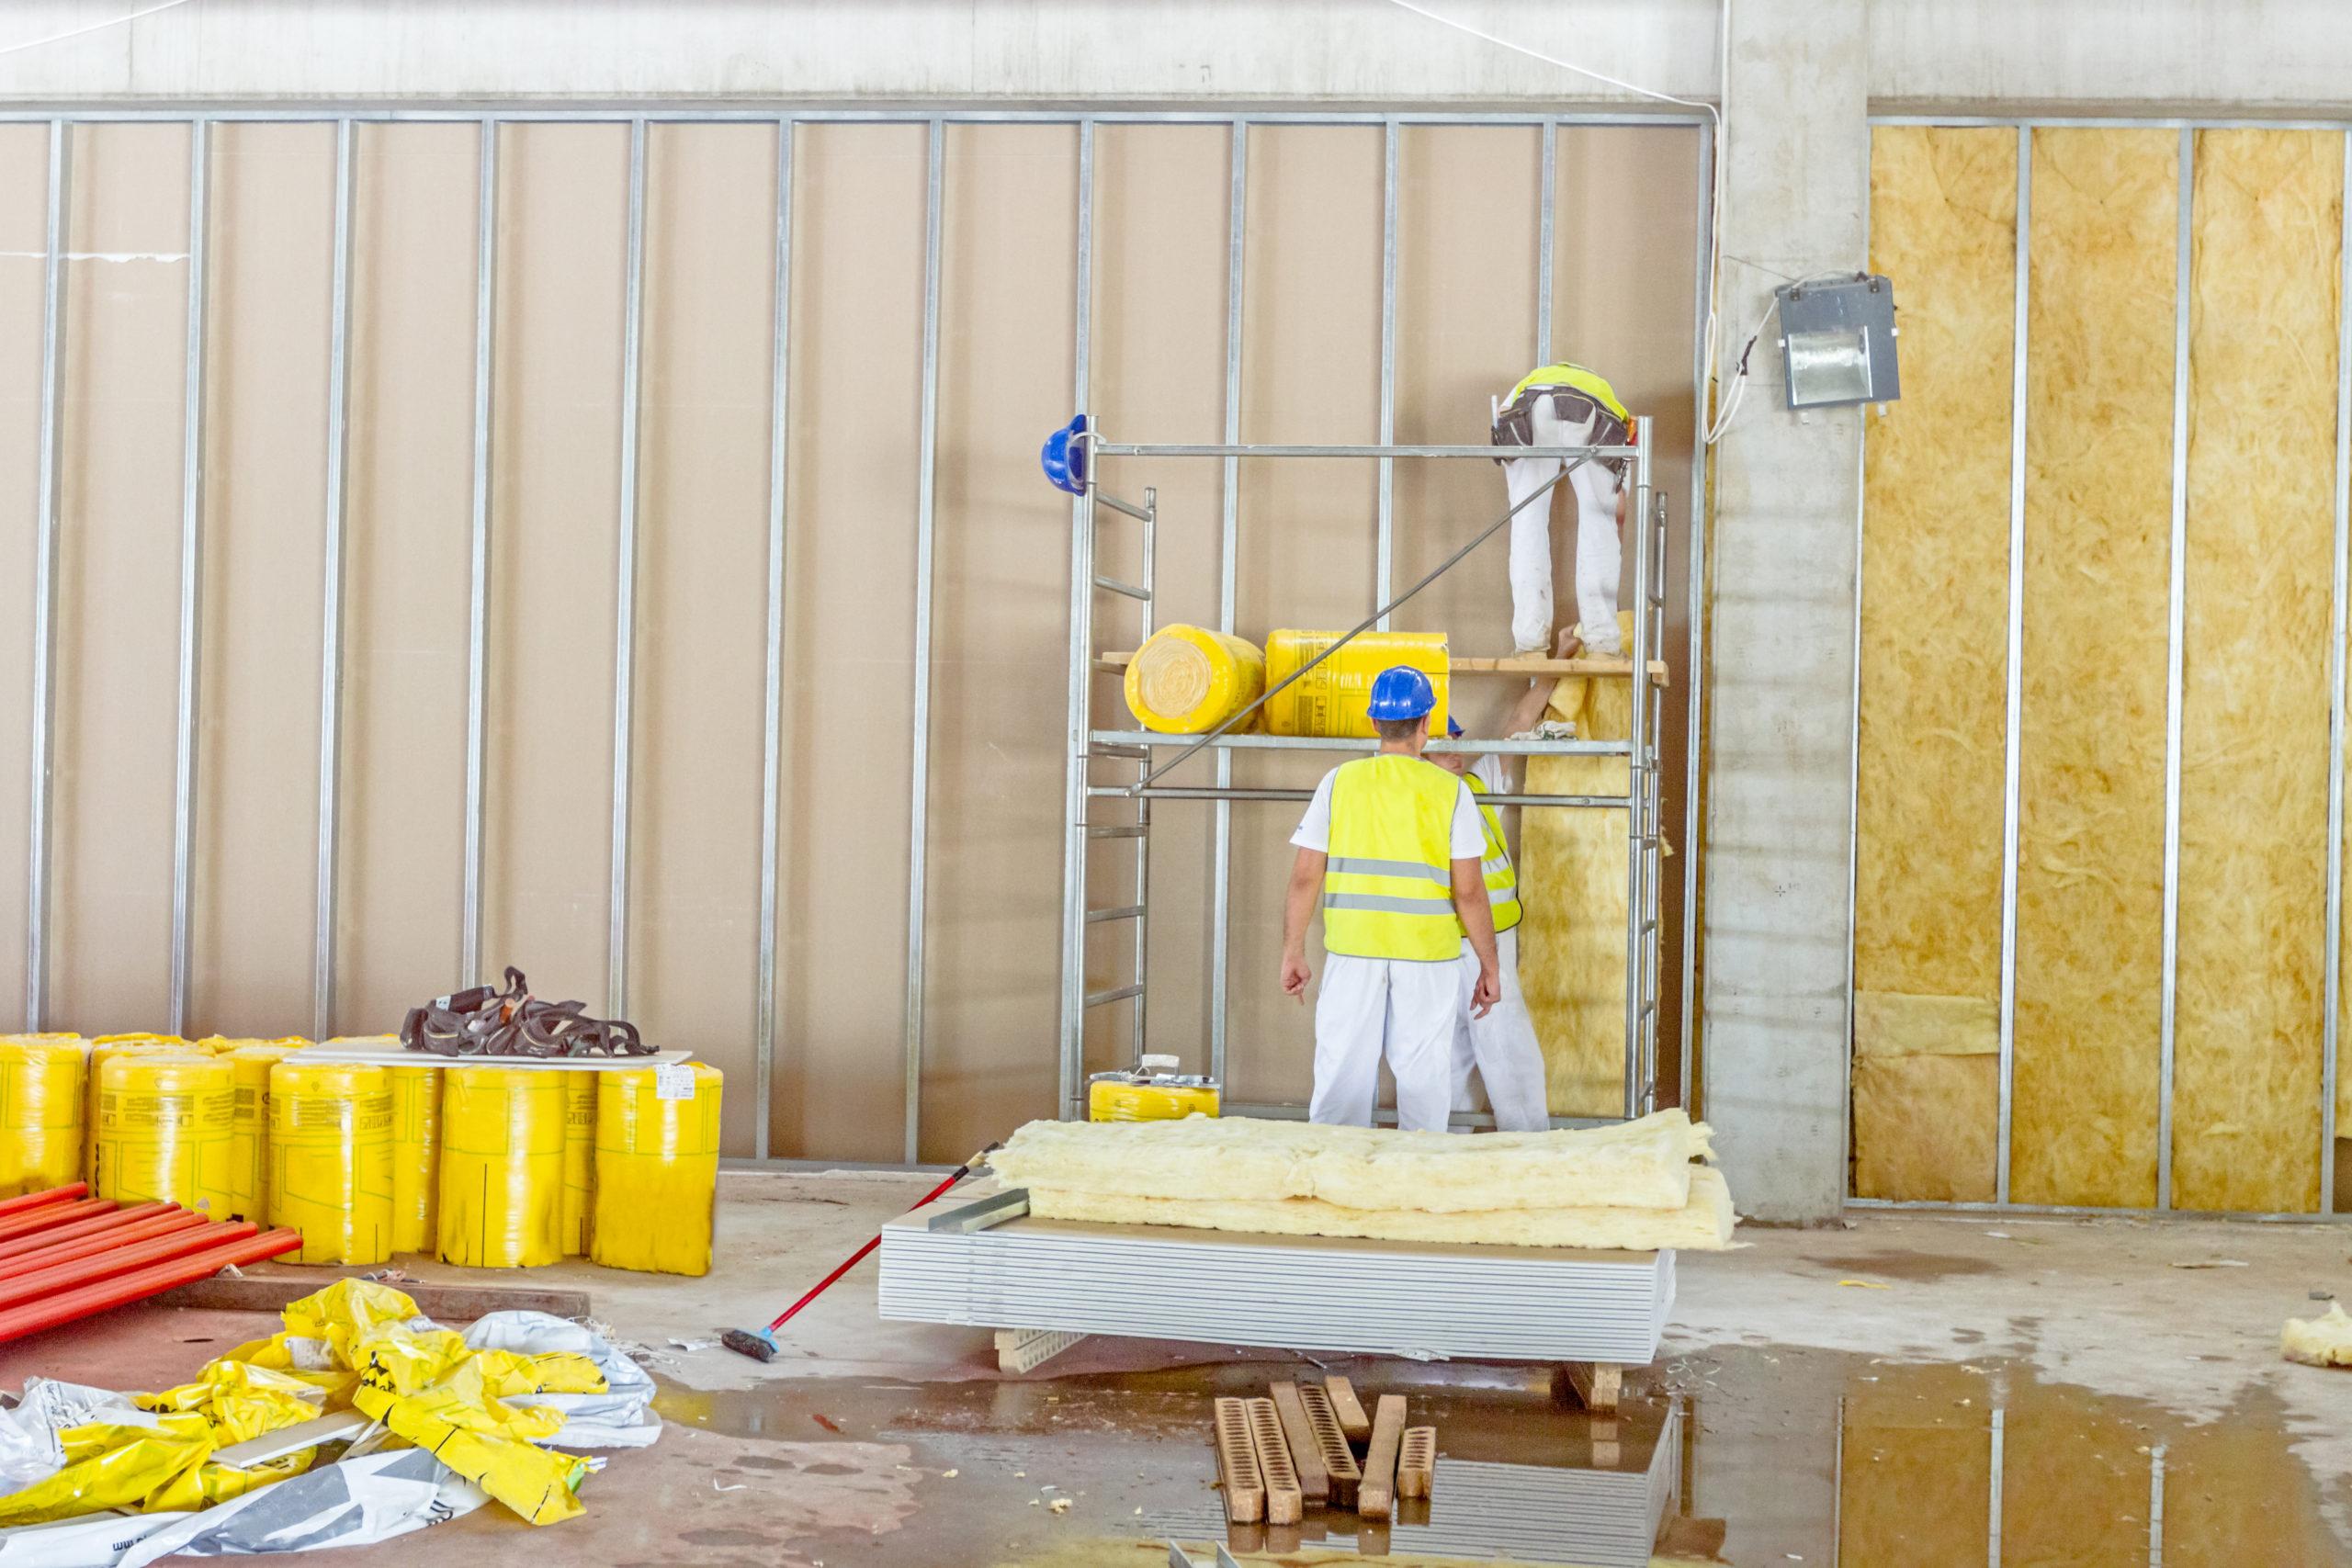 "Zrenjanin, Vojvodina, Serbia – June 29, 2015: Building activities during construction of the large complex shopping mall ""AVIV PARK"" in Zrenjanin city."